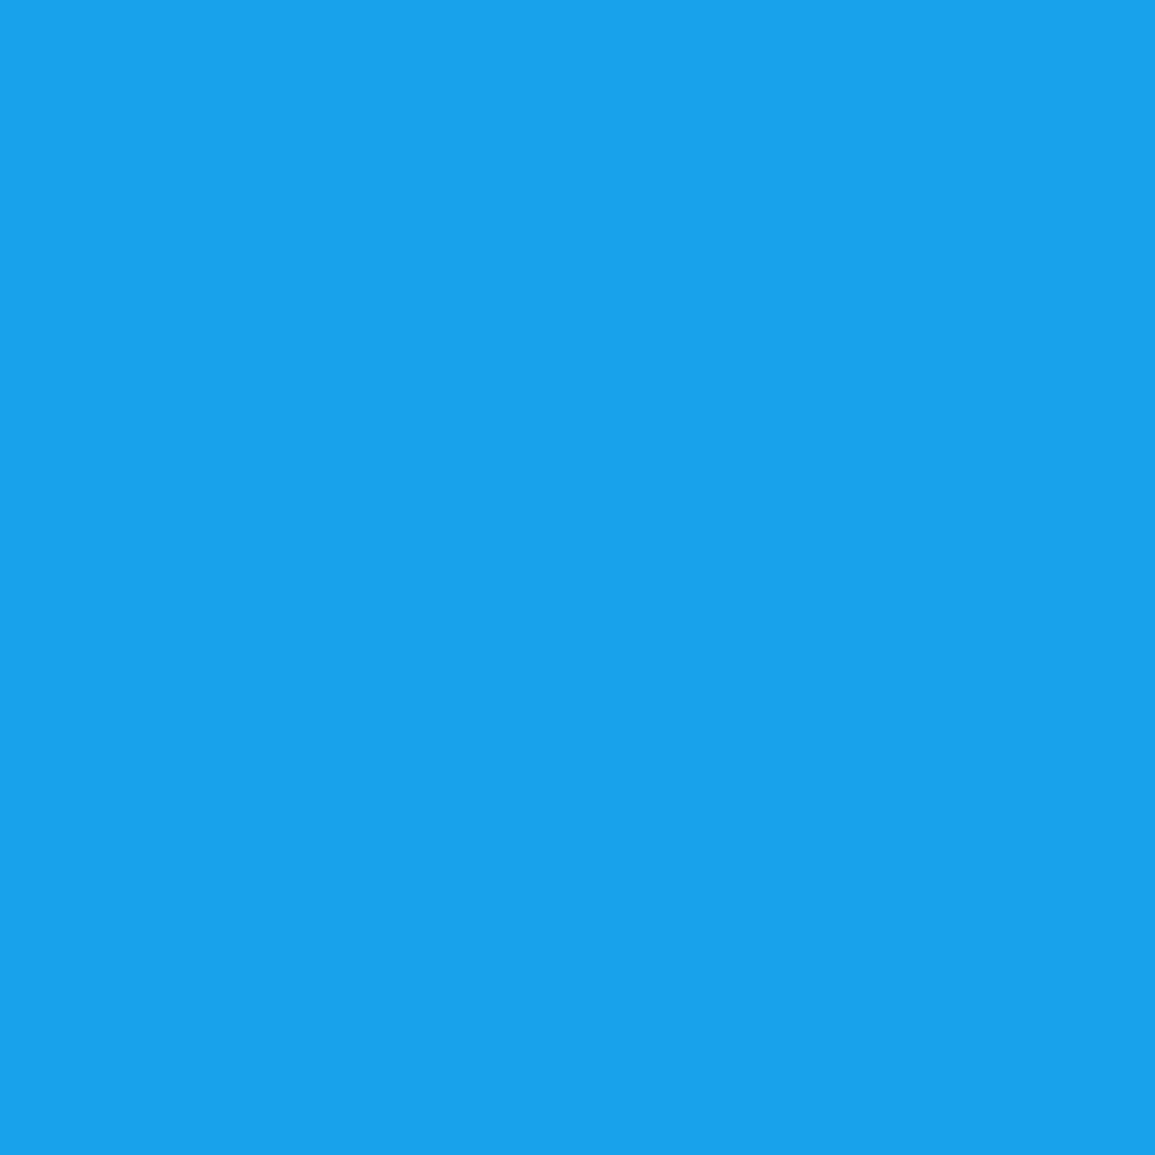 BIG BLUE BKGD UPDATED.jpg